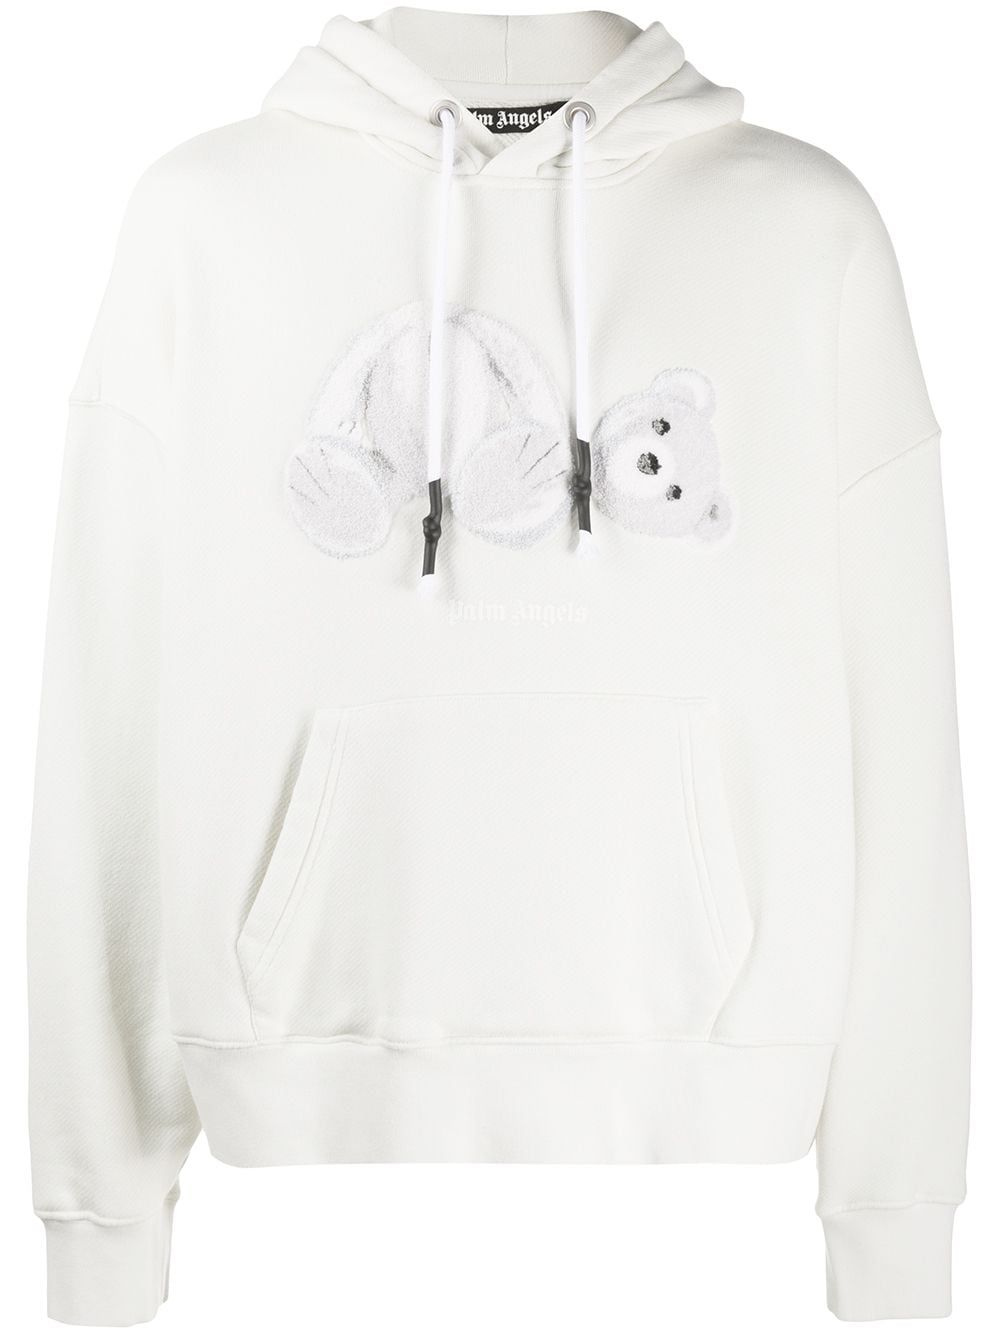 Palm Angels Teddy Bear Hooded Sweatshirt Farfetch Hooded Sweatshirts Sweatshirts Angel Teddy Bear [ 1334 x 1000 Pixel ]